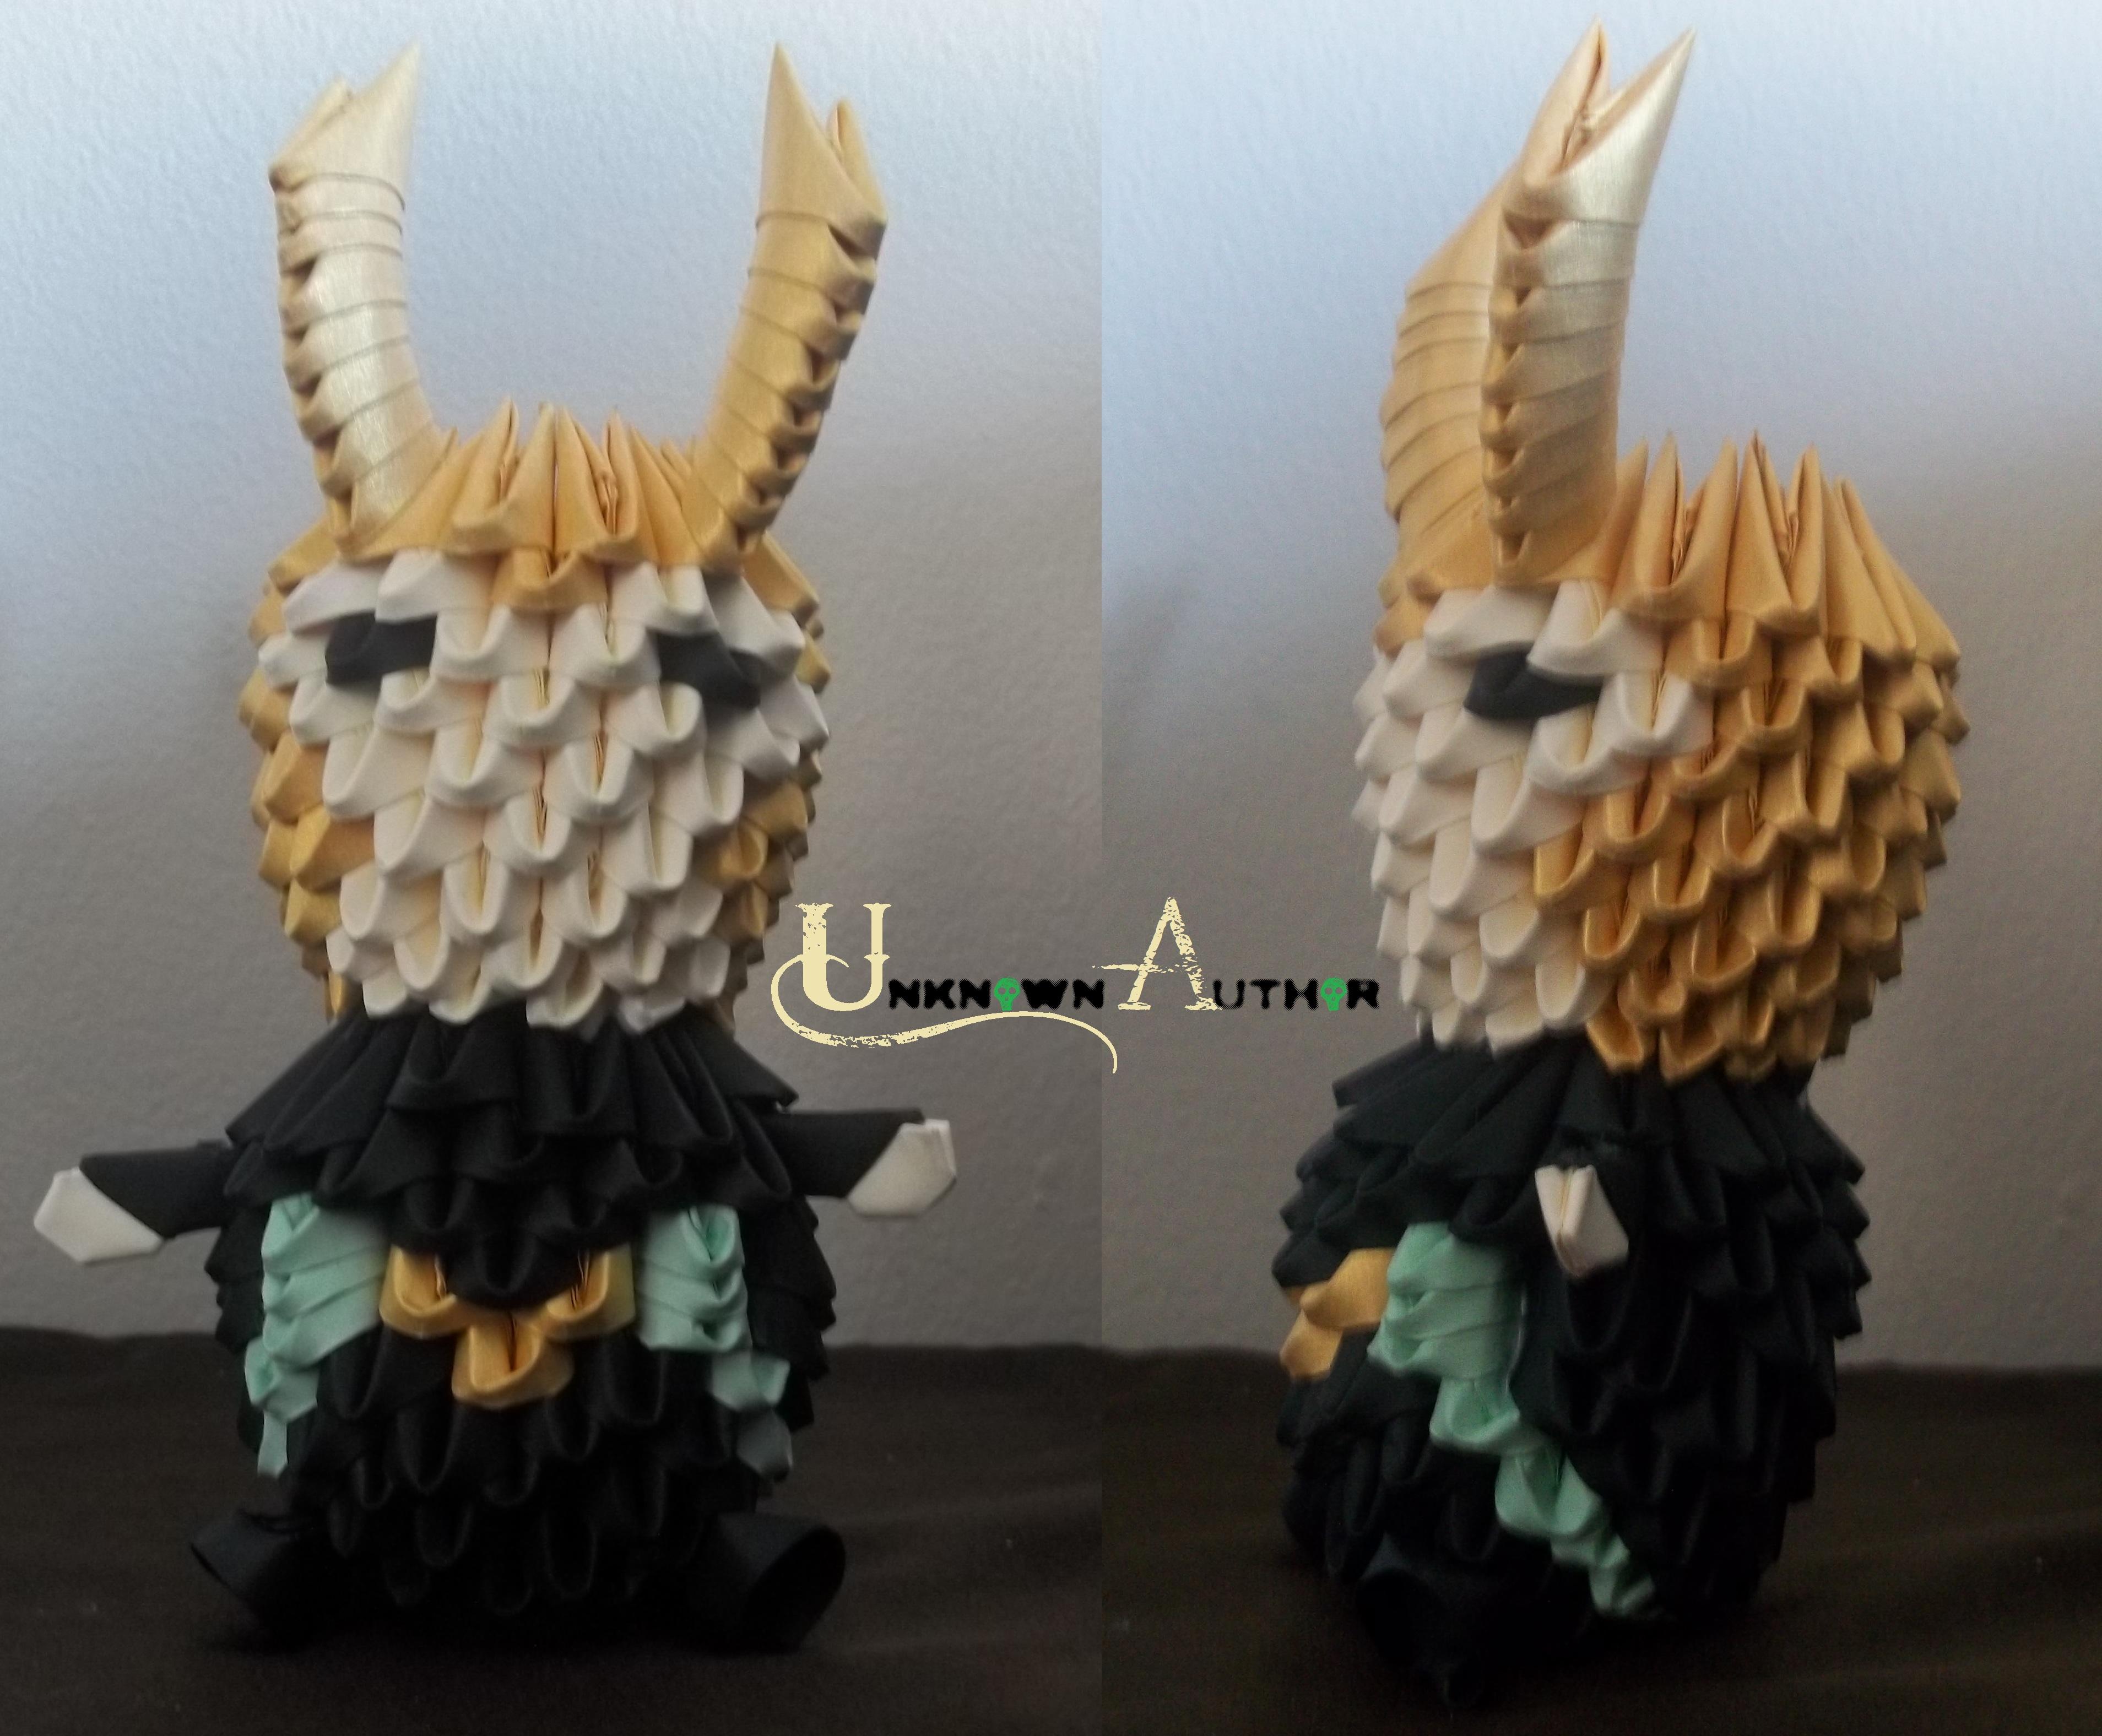 3D Origami - Chibi Loki by Jobe3DO